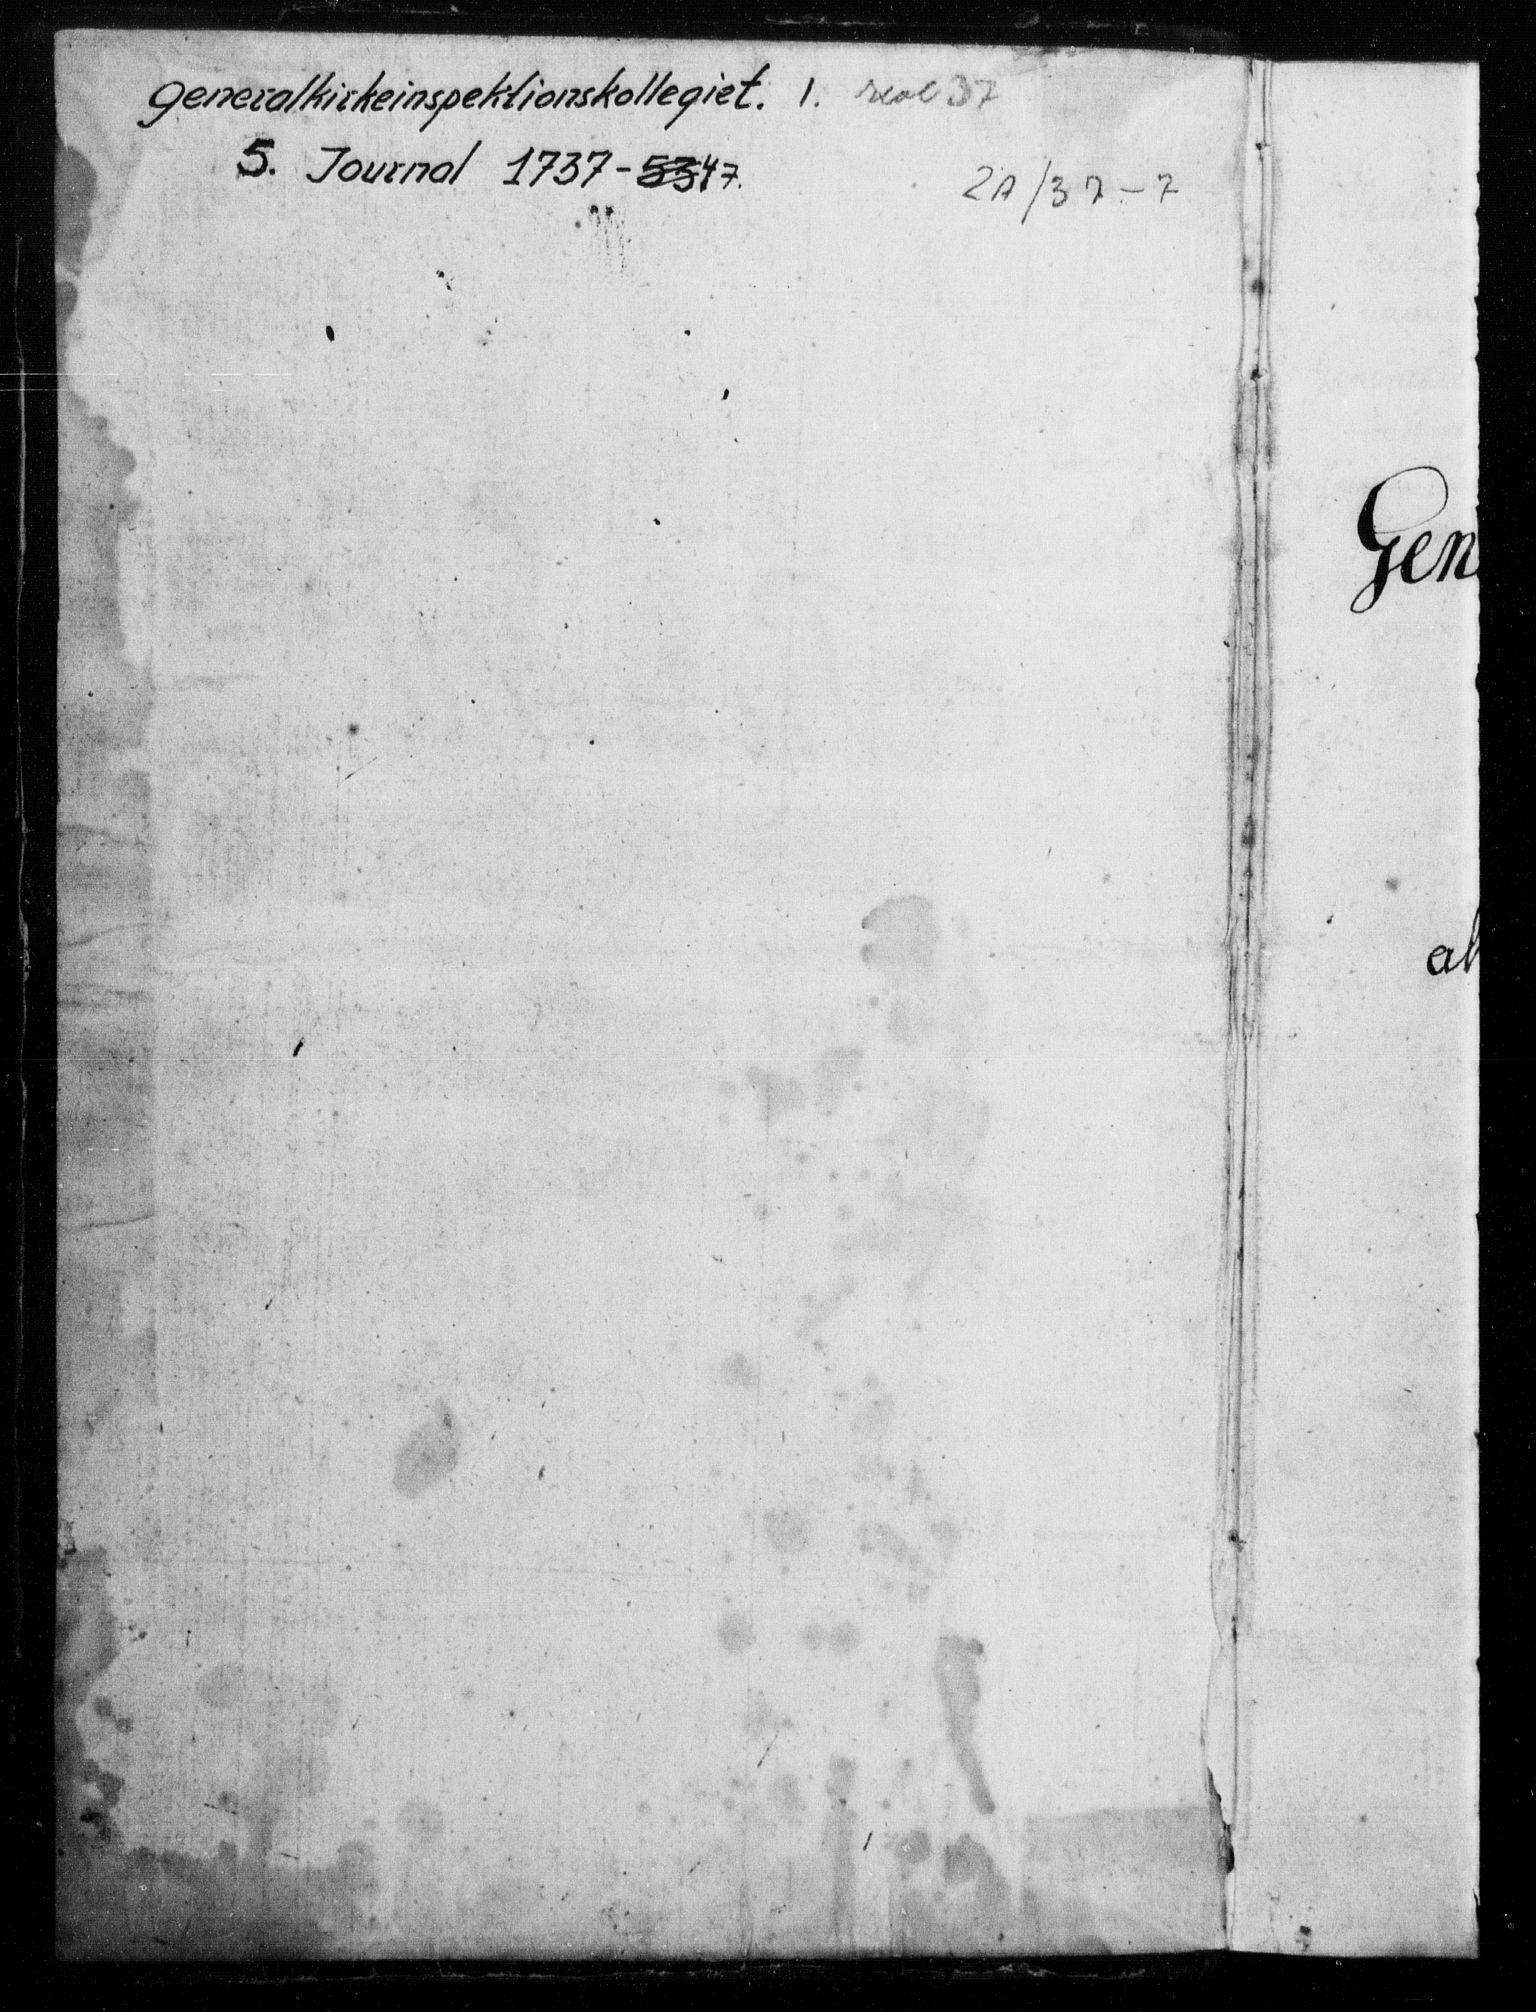 DRA, Generalkirkeinspektionskollegiet, F4-05/F4-05: General-Kirke-Inspectionens Protocoll over alle indkomne Brefve, Relationer og andre Documenter, 1737-1747